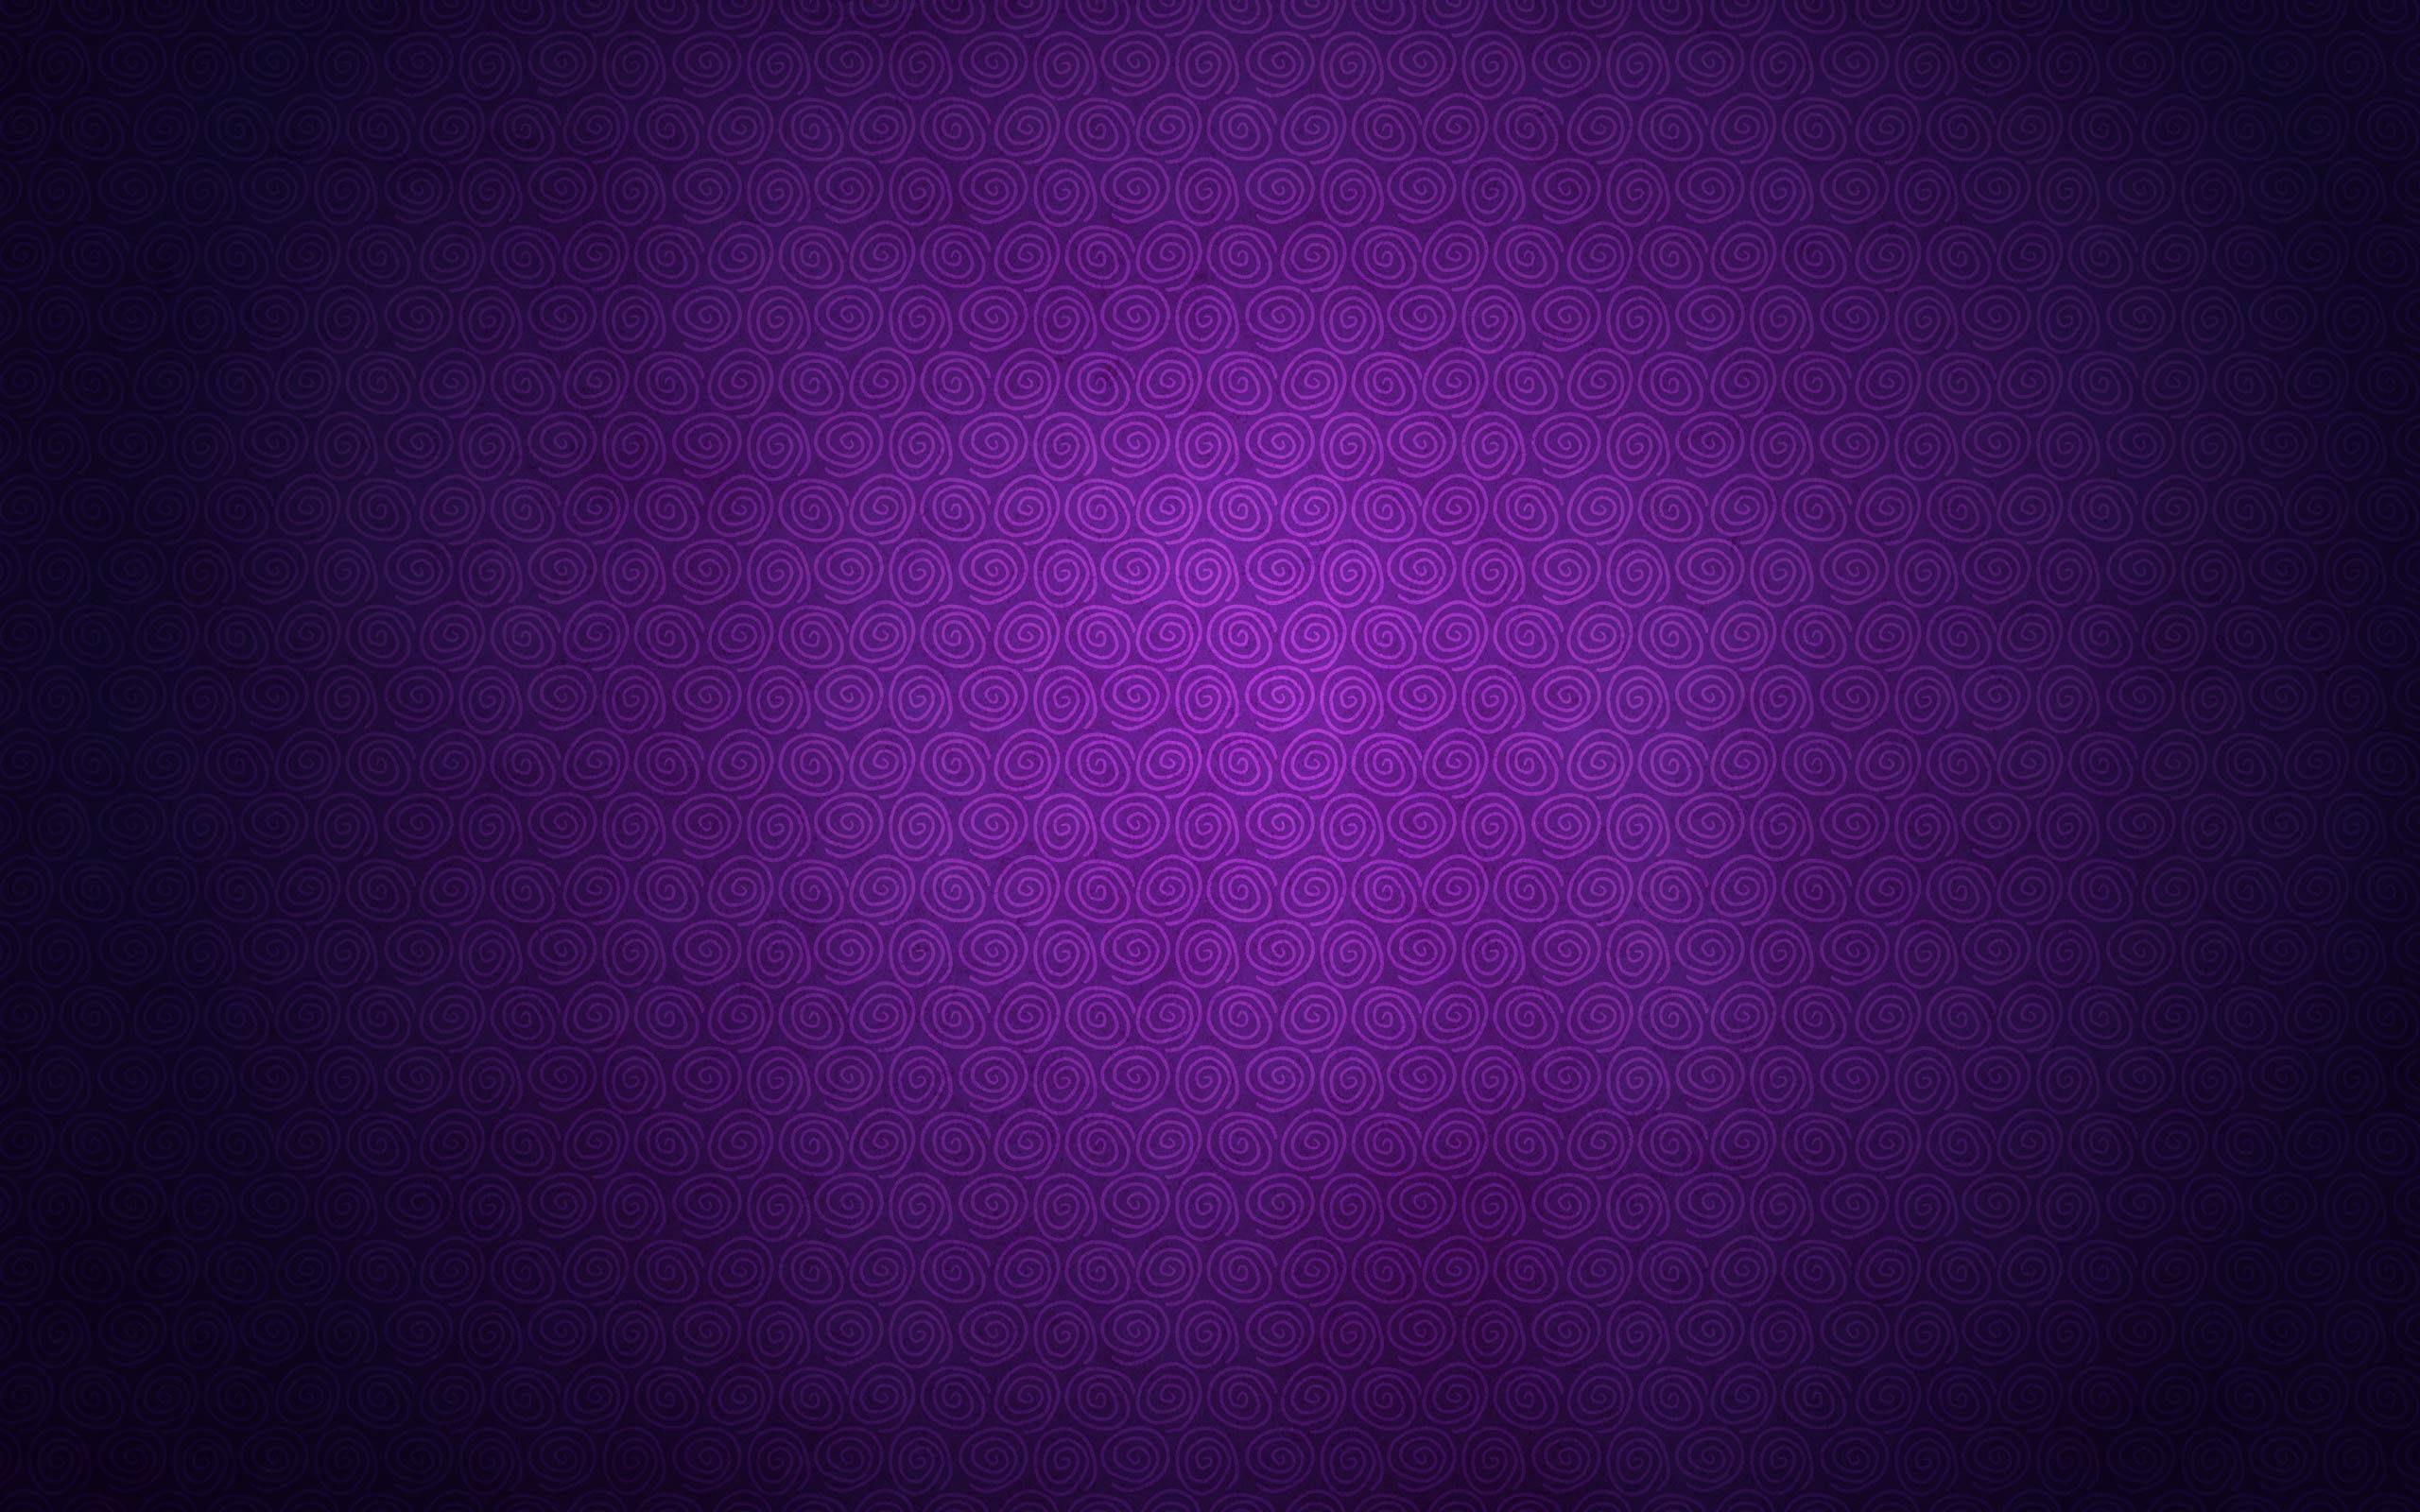 Purple Patterns Backgrounds Wallpapers Jpg 2560 215 1600